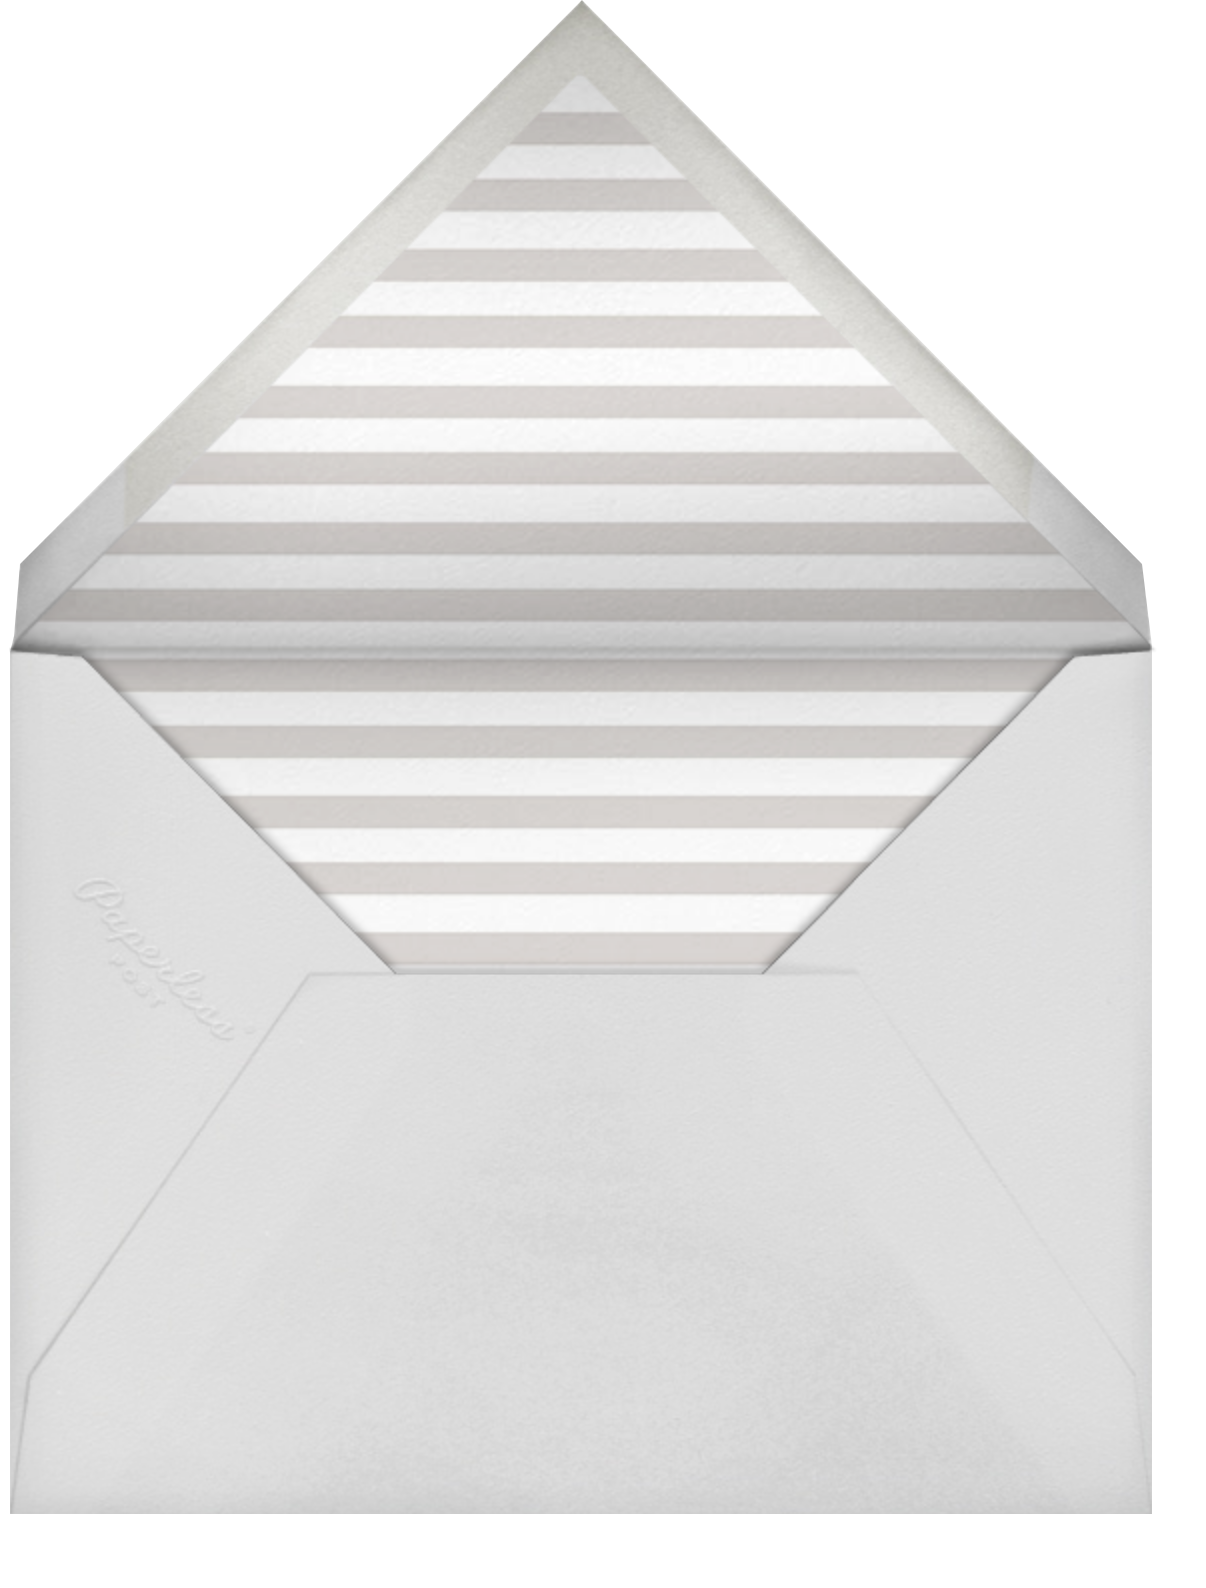 Square Frame - Horizontal (Gray) - Paperless Post - Birth - envelope back